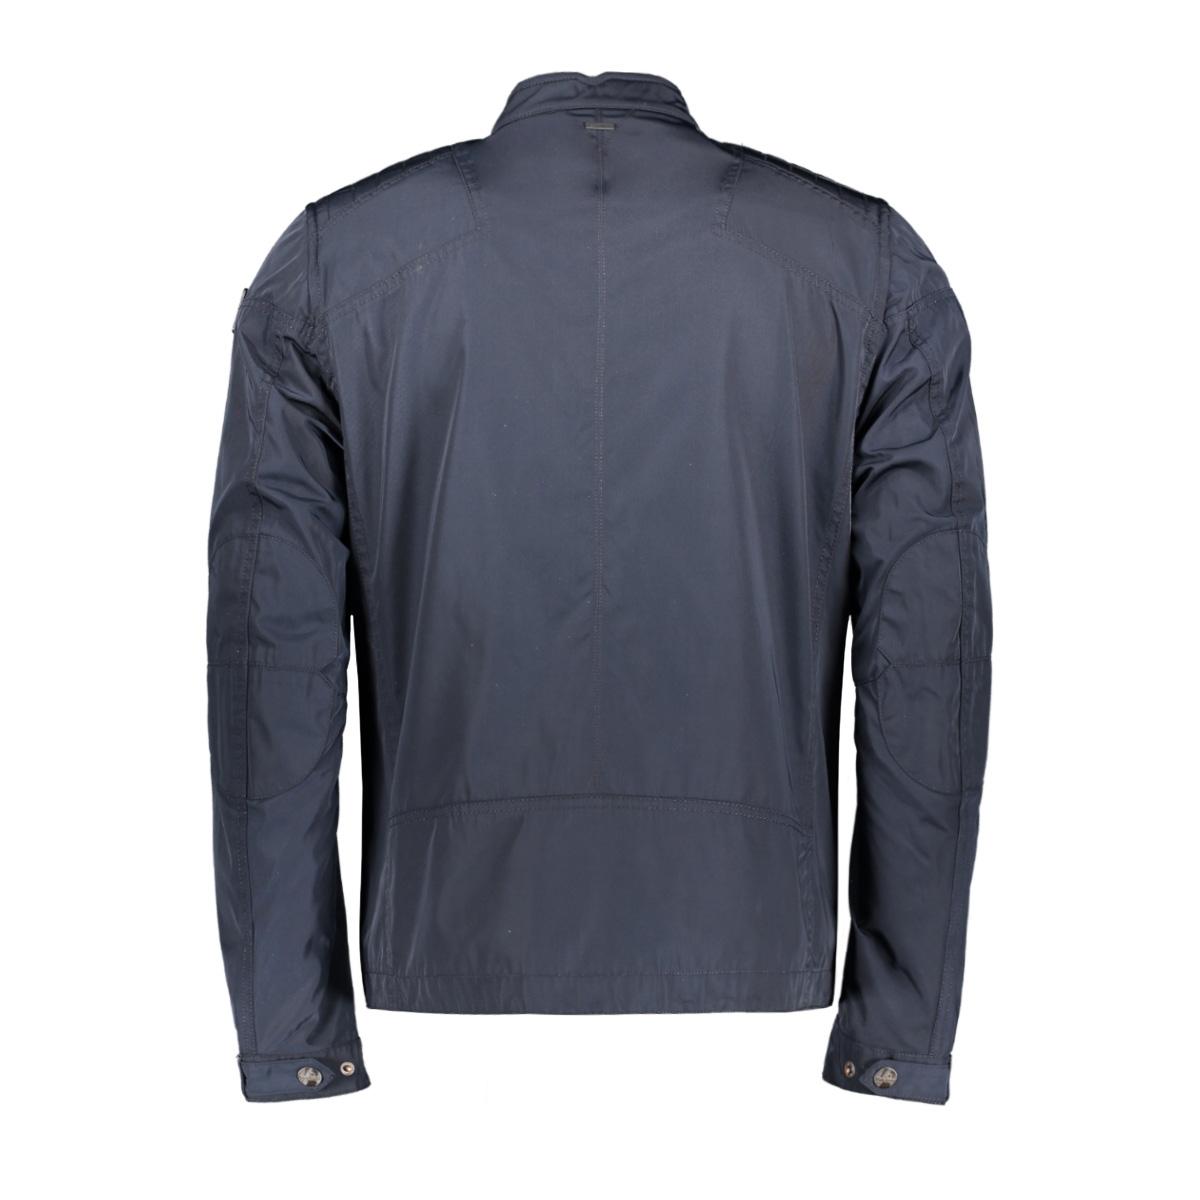 chasetrack jacket vja201111 vanguard jas 5281